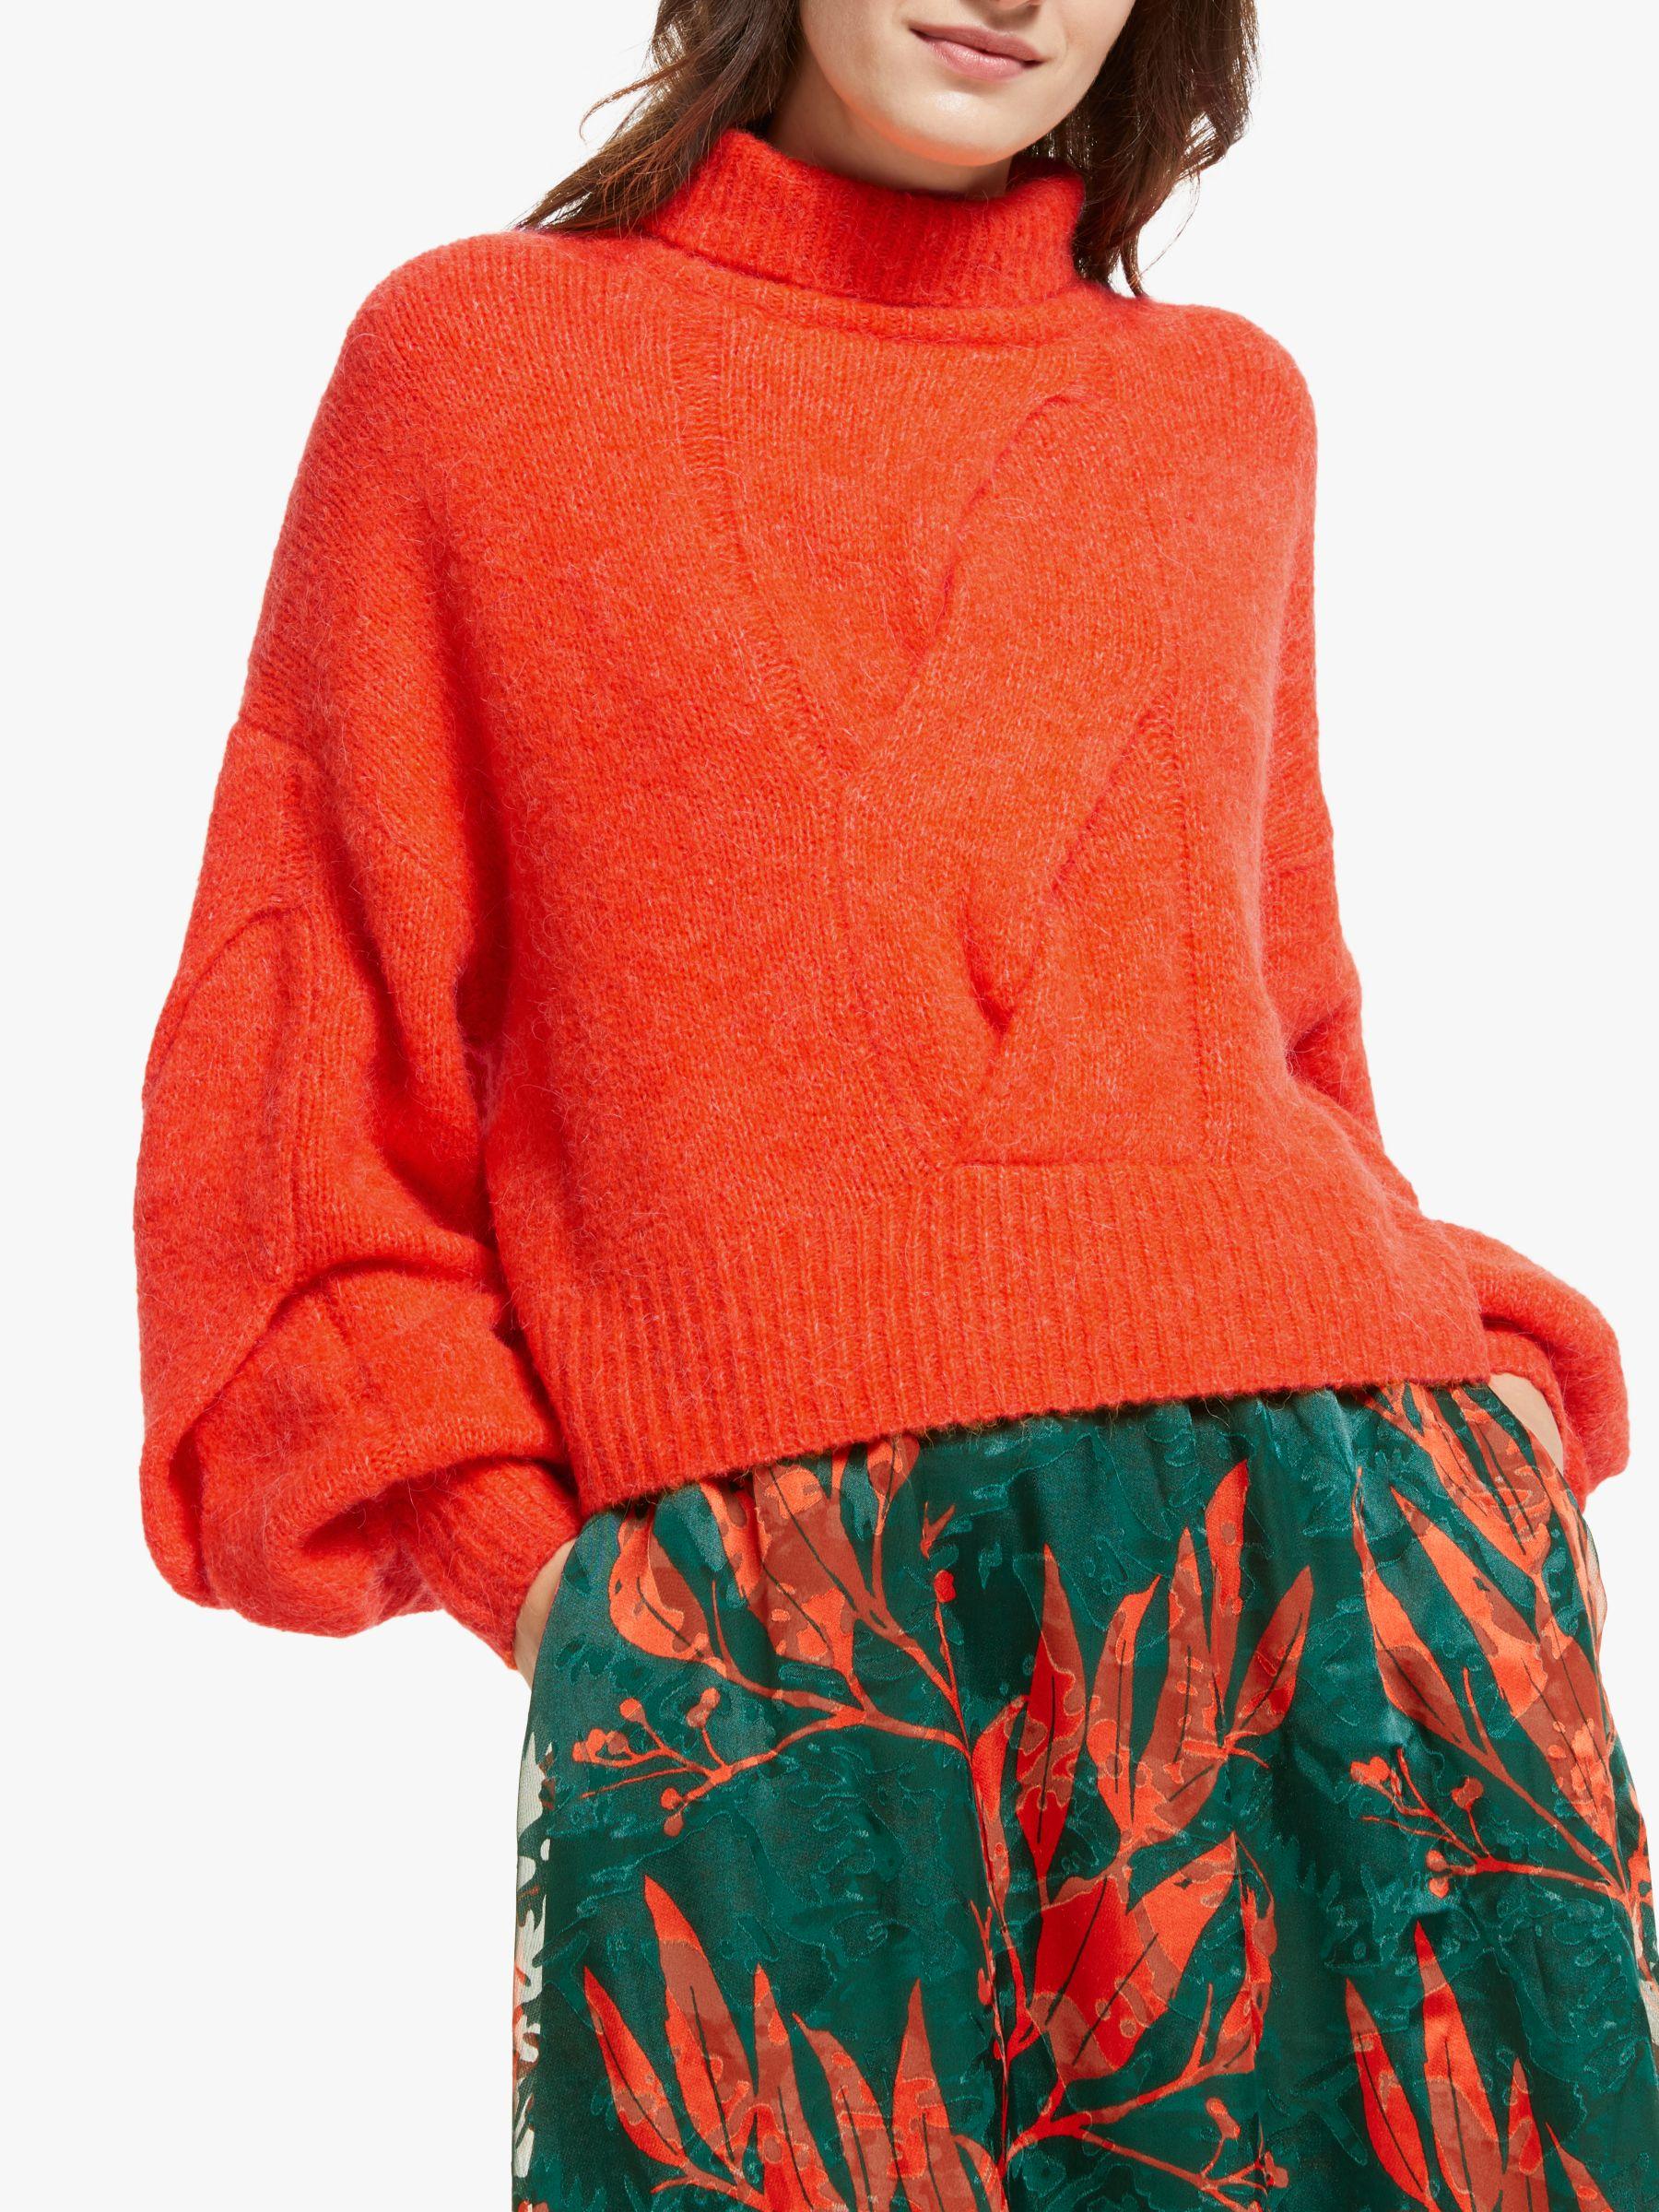 Y.a.s Y.A.S Lexie Knit Long Sleeve Jumper, Orange